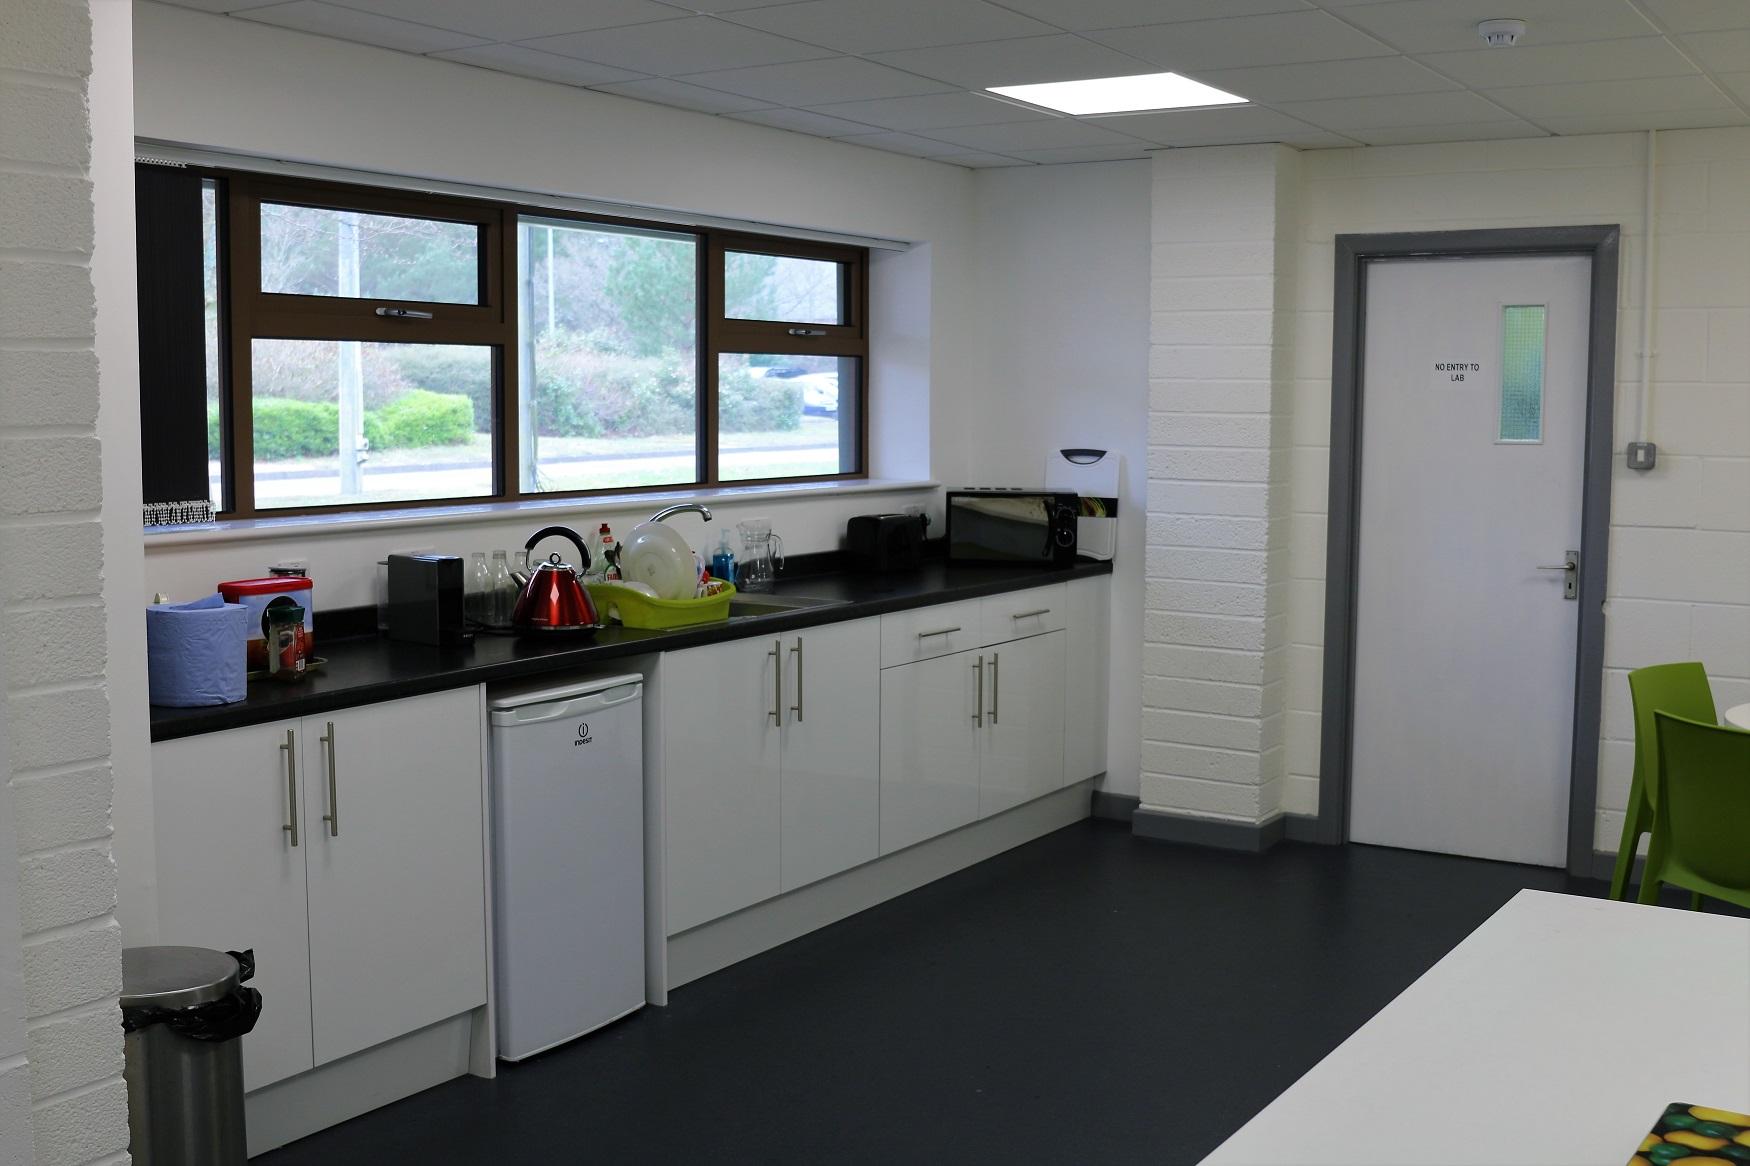 Refurbished kitchen break out area